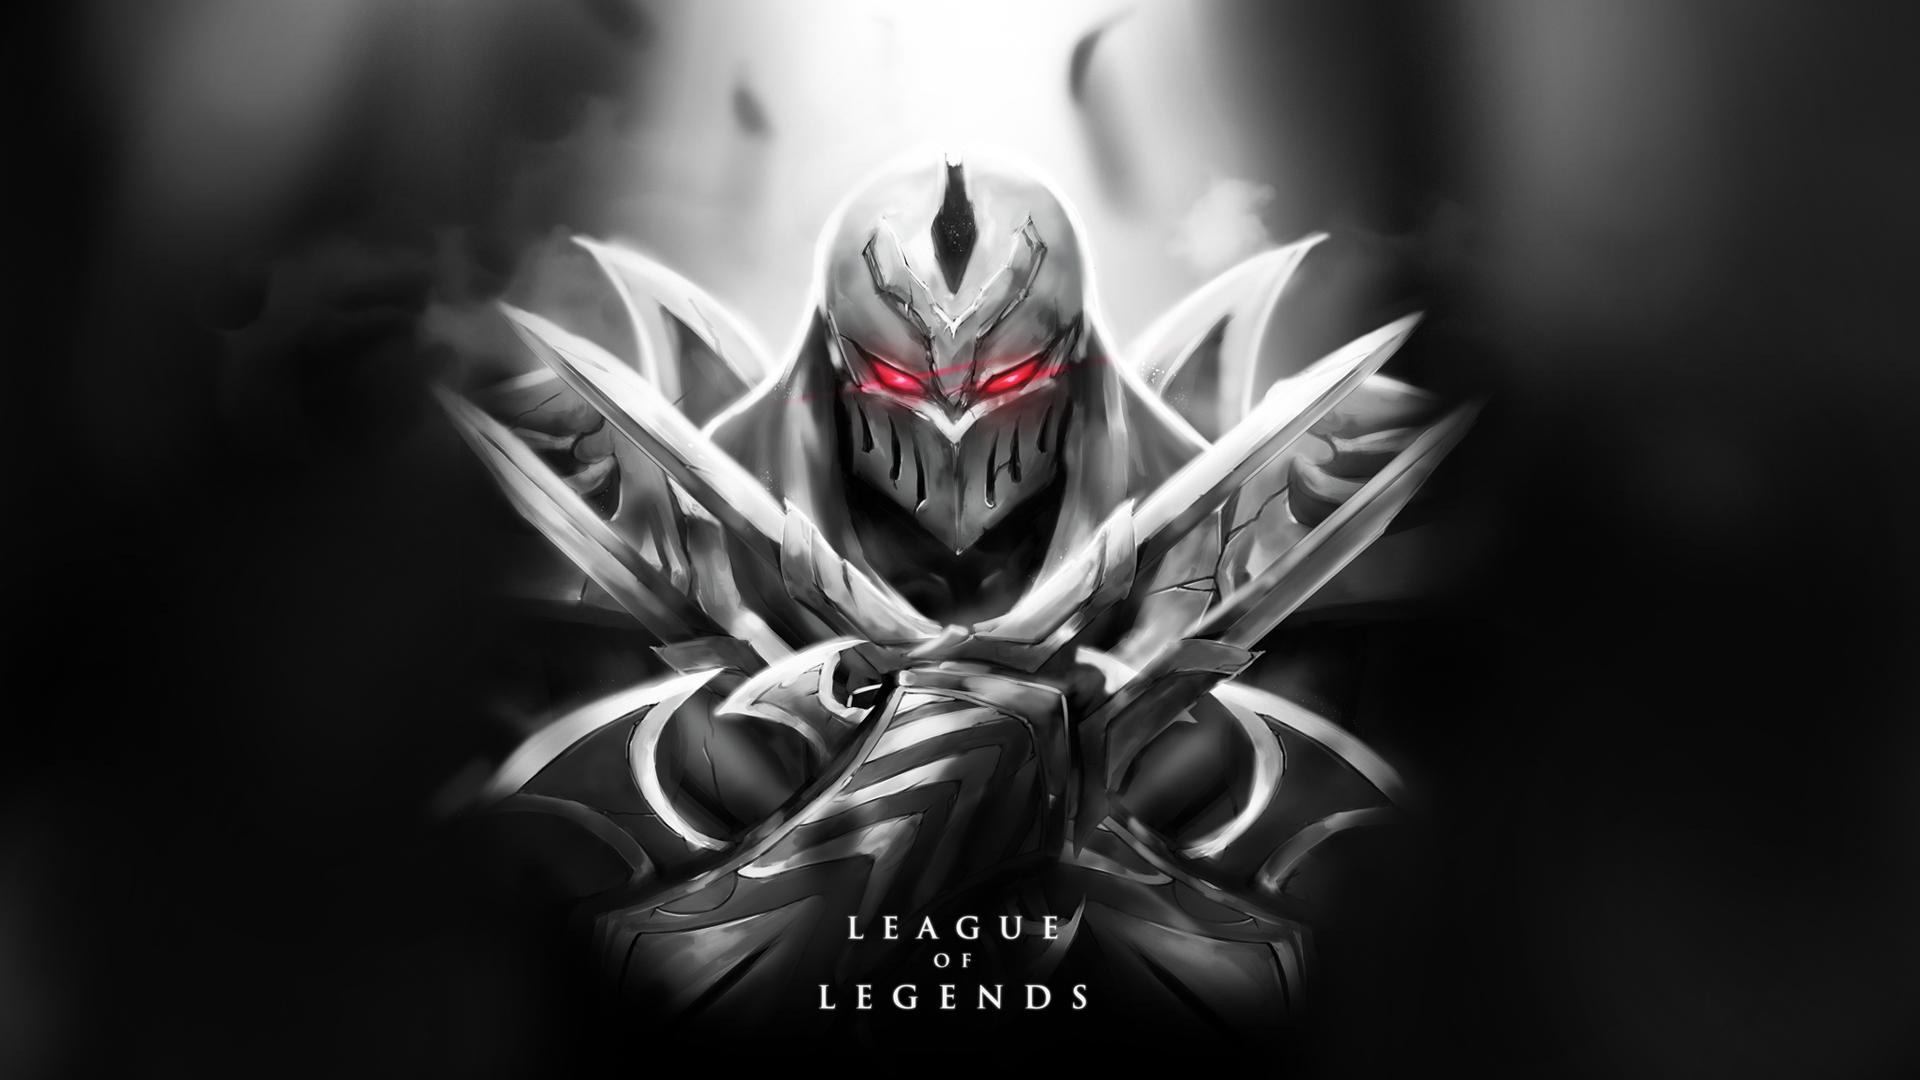 League of Legends wallpaper 109